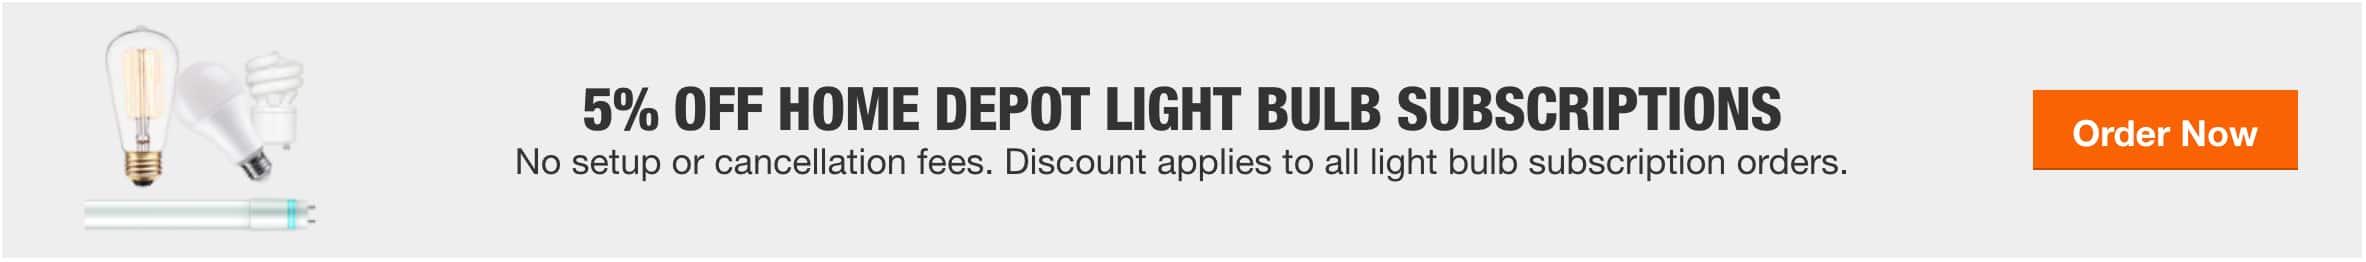 5% OFF HOME DEPOT LIGHT BULB SUBSCRIPTIONS